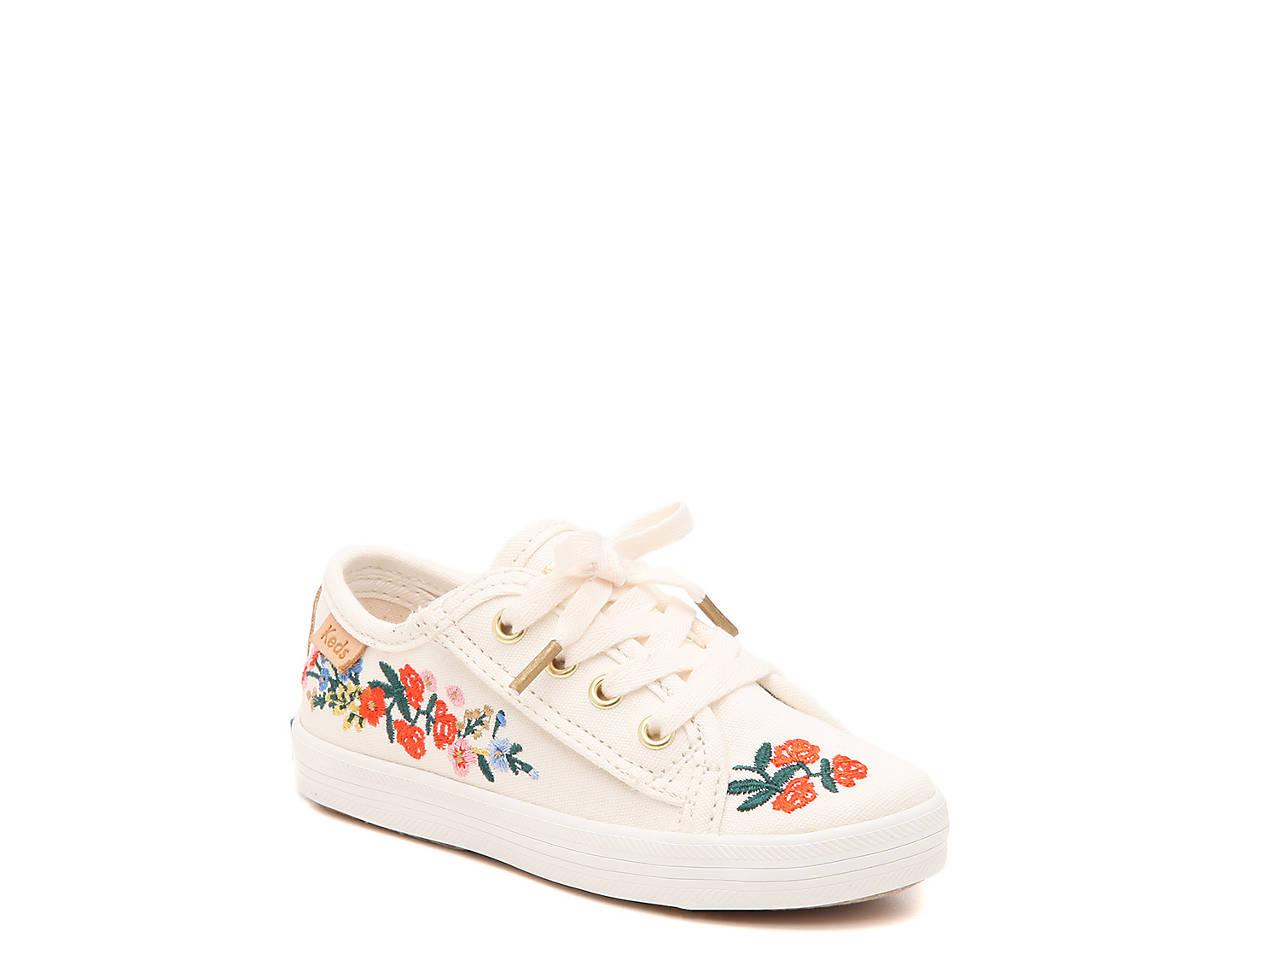 6fdfb7585deaa Kickstart Jr Sneaker - Kids'